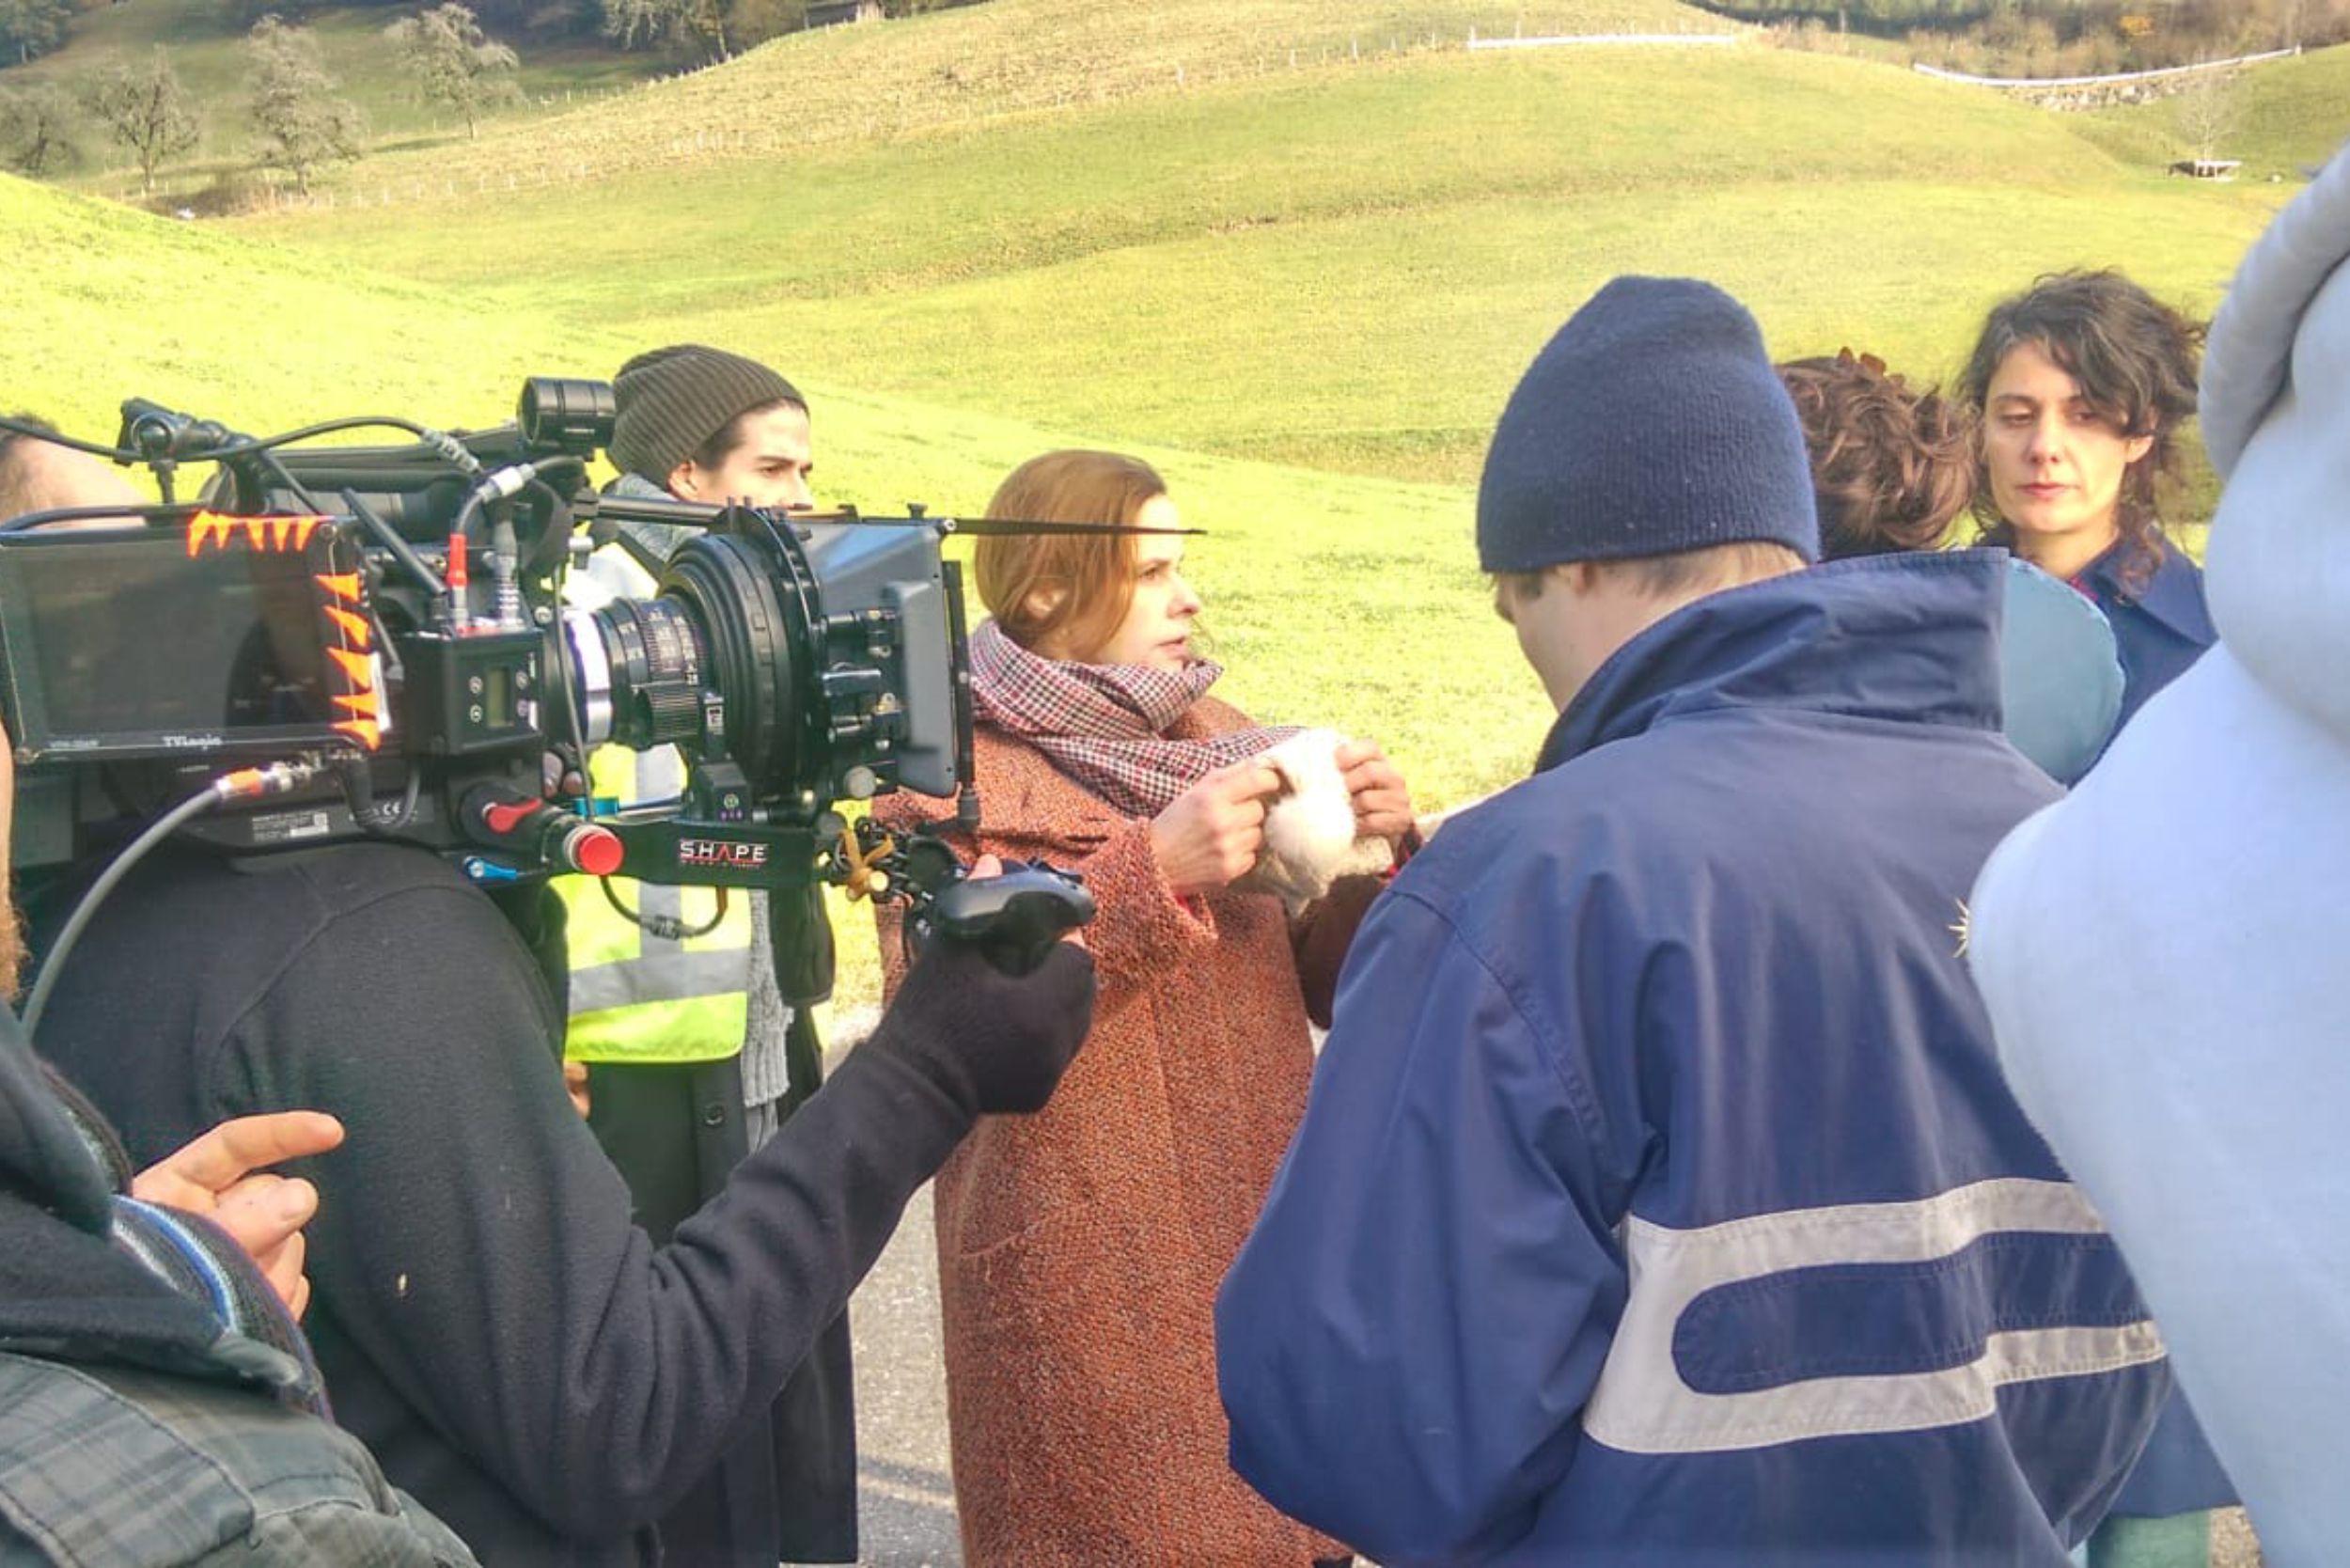 INTERVIEW WITH CINEMATOGRAPHER SIMON DENZLER